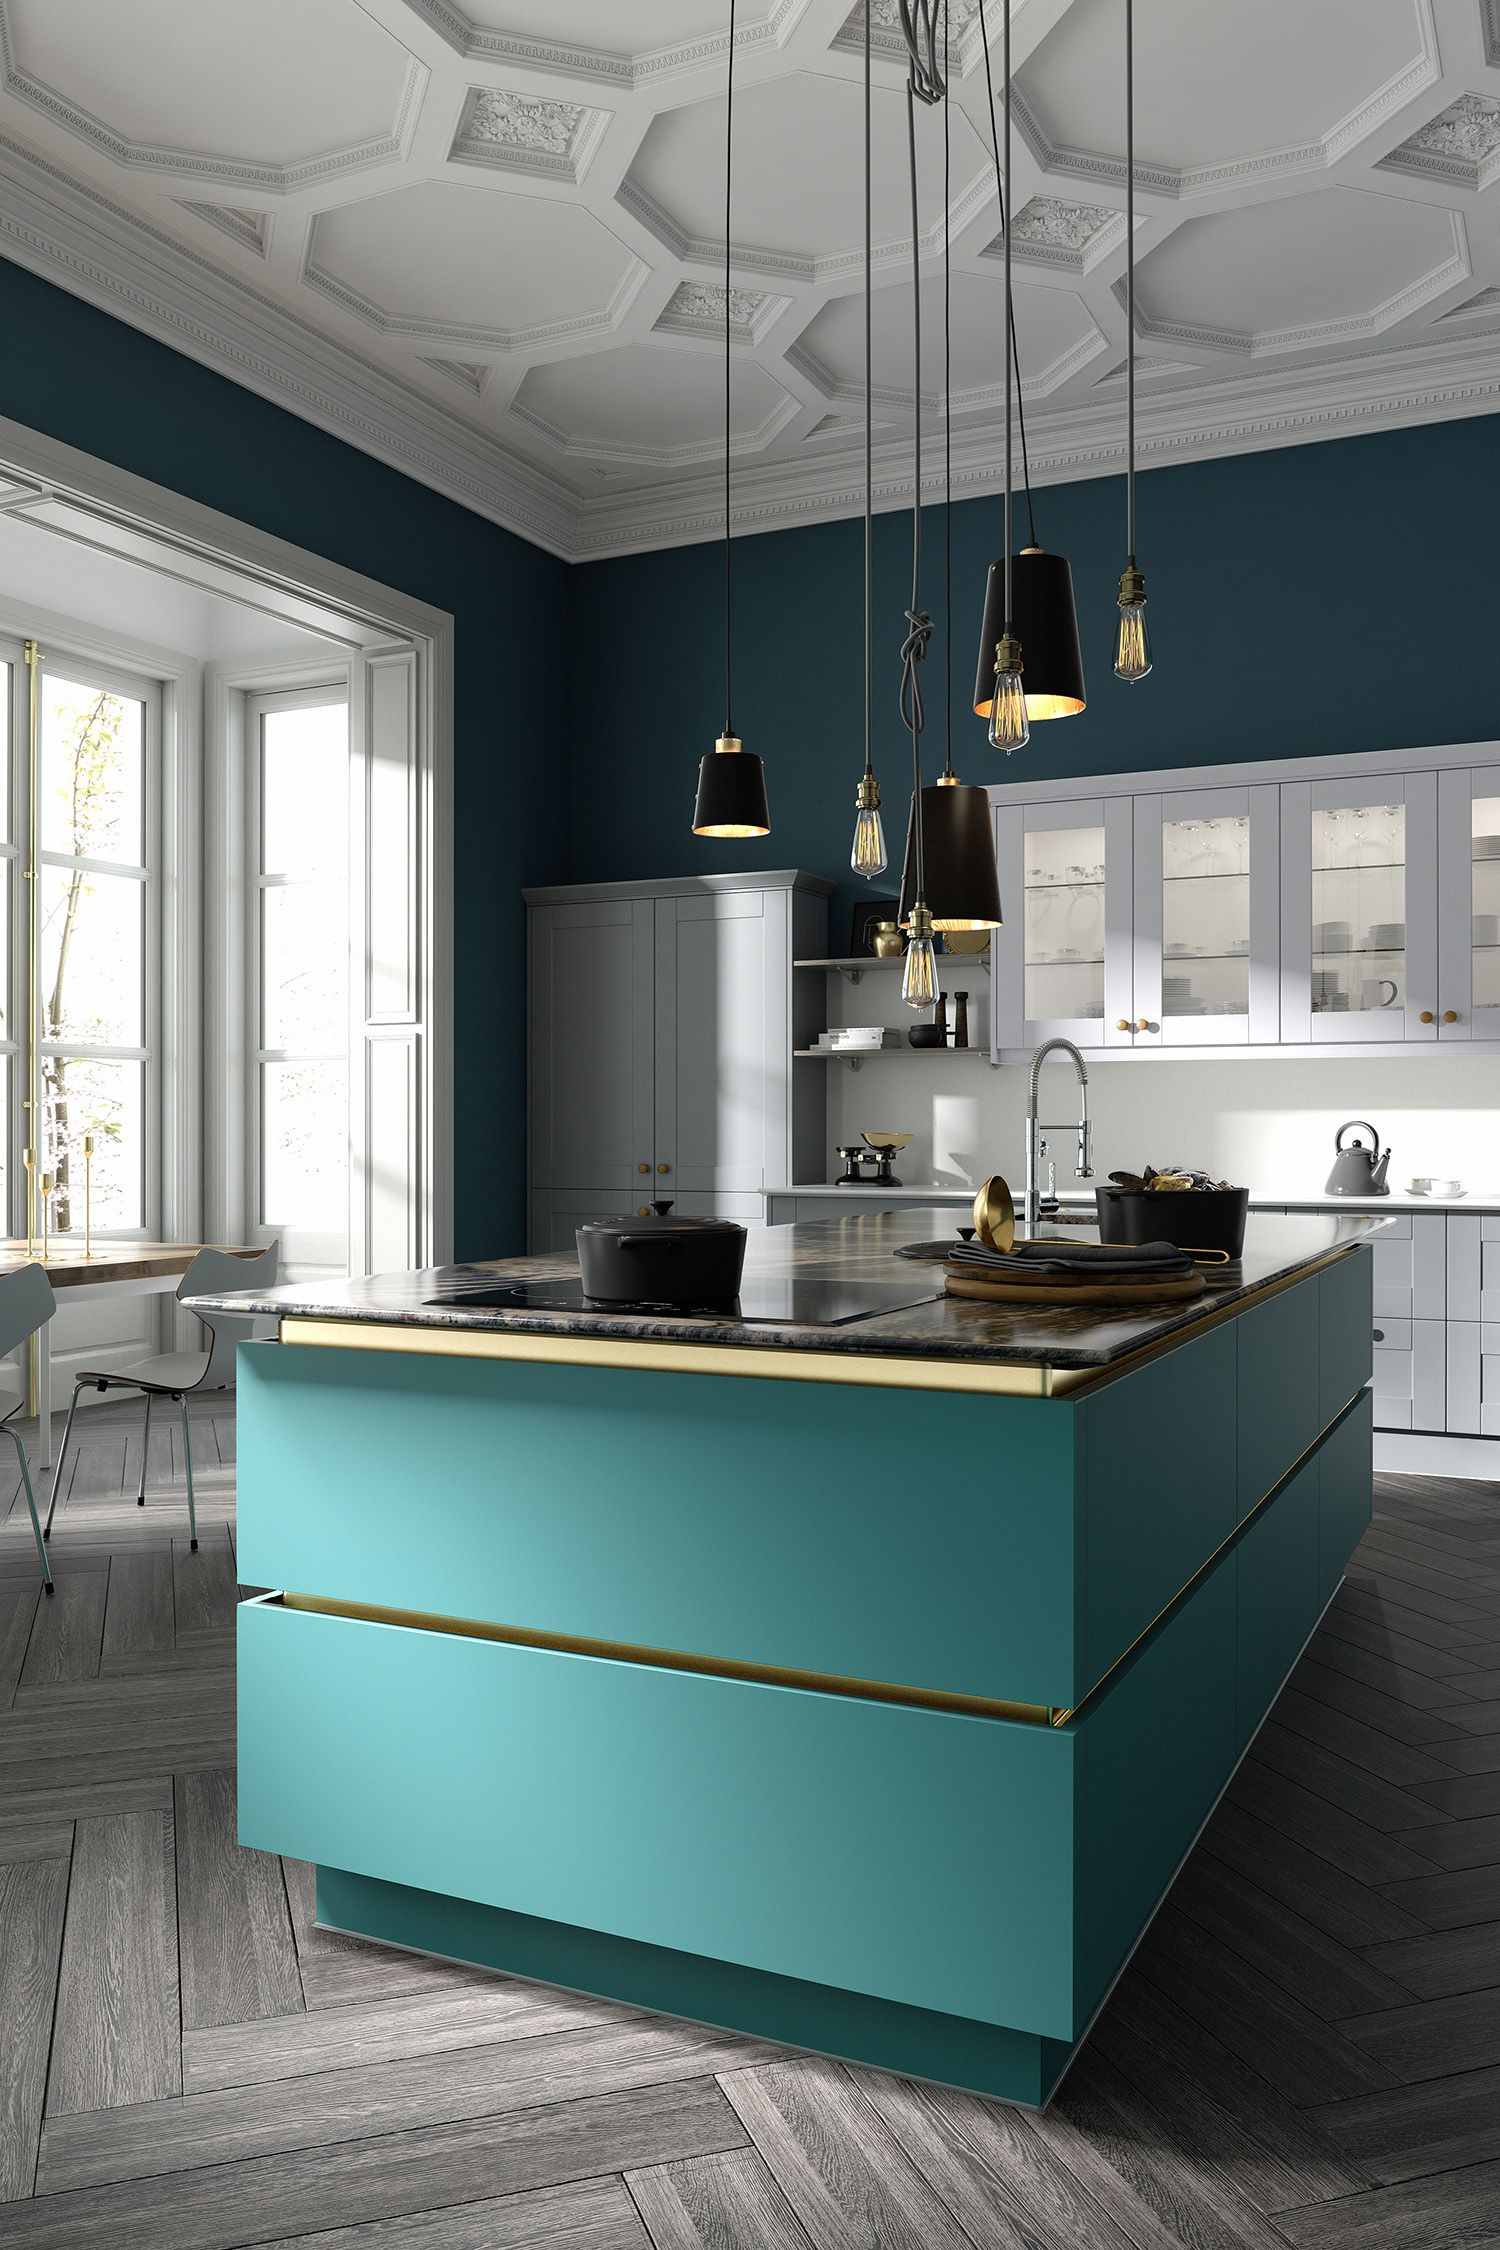 Image result for wren milano lagoon   Fungalow Kitchen   Pinterest ...